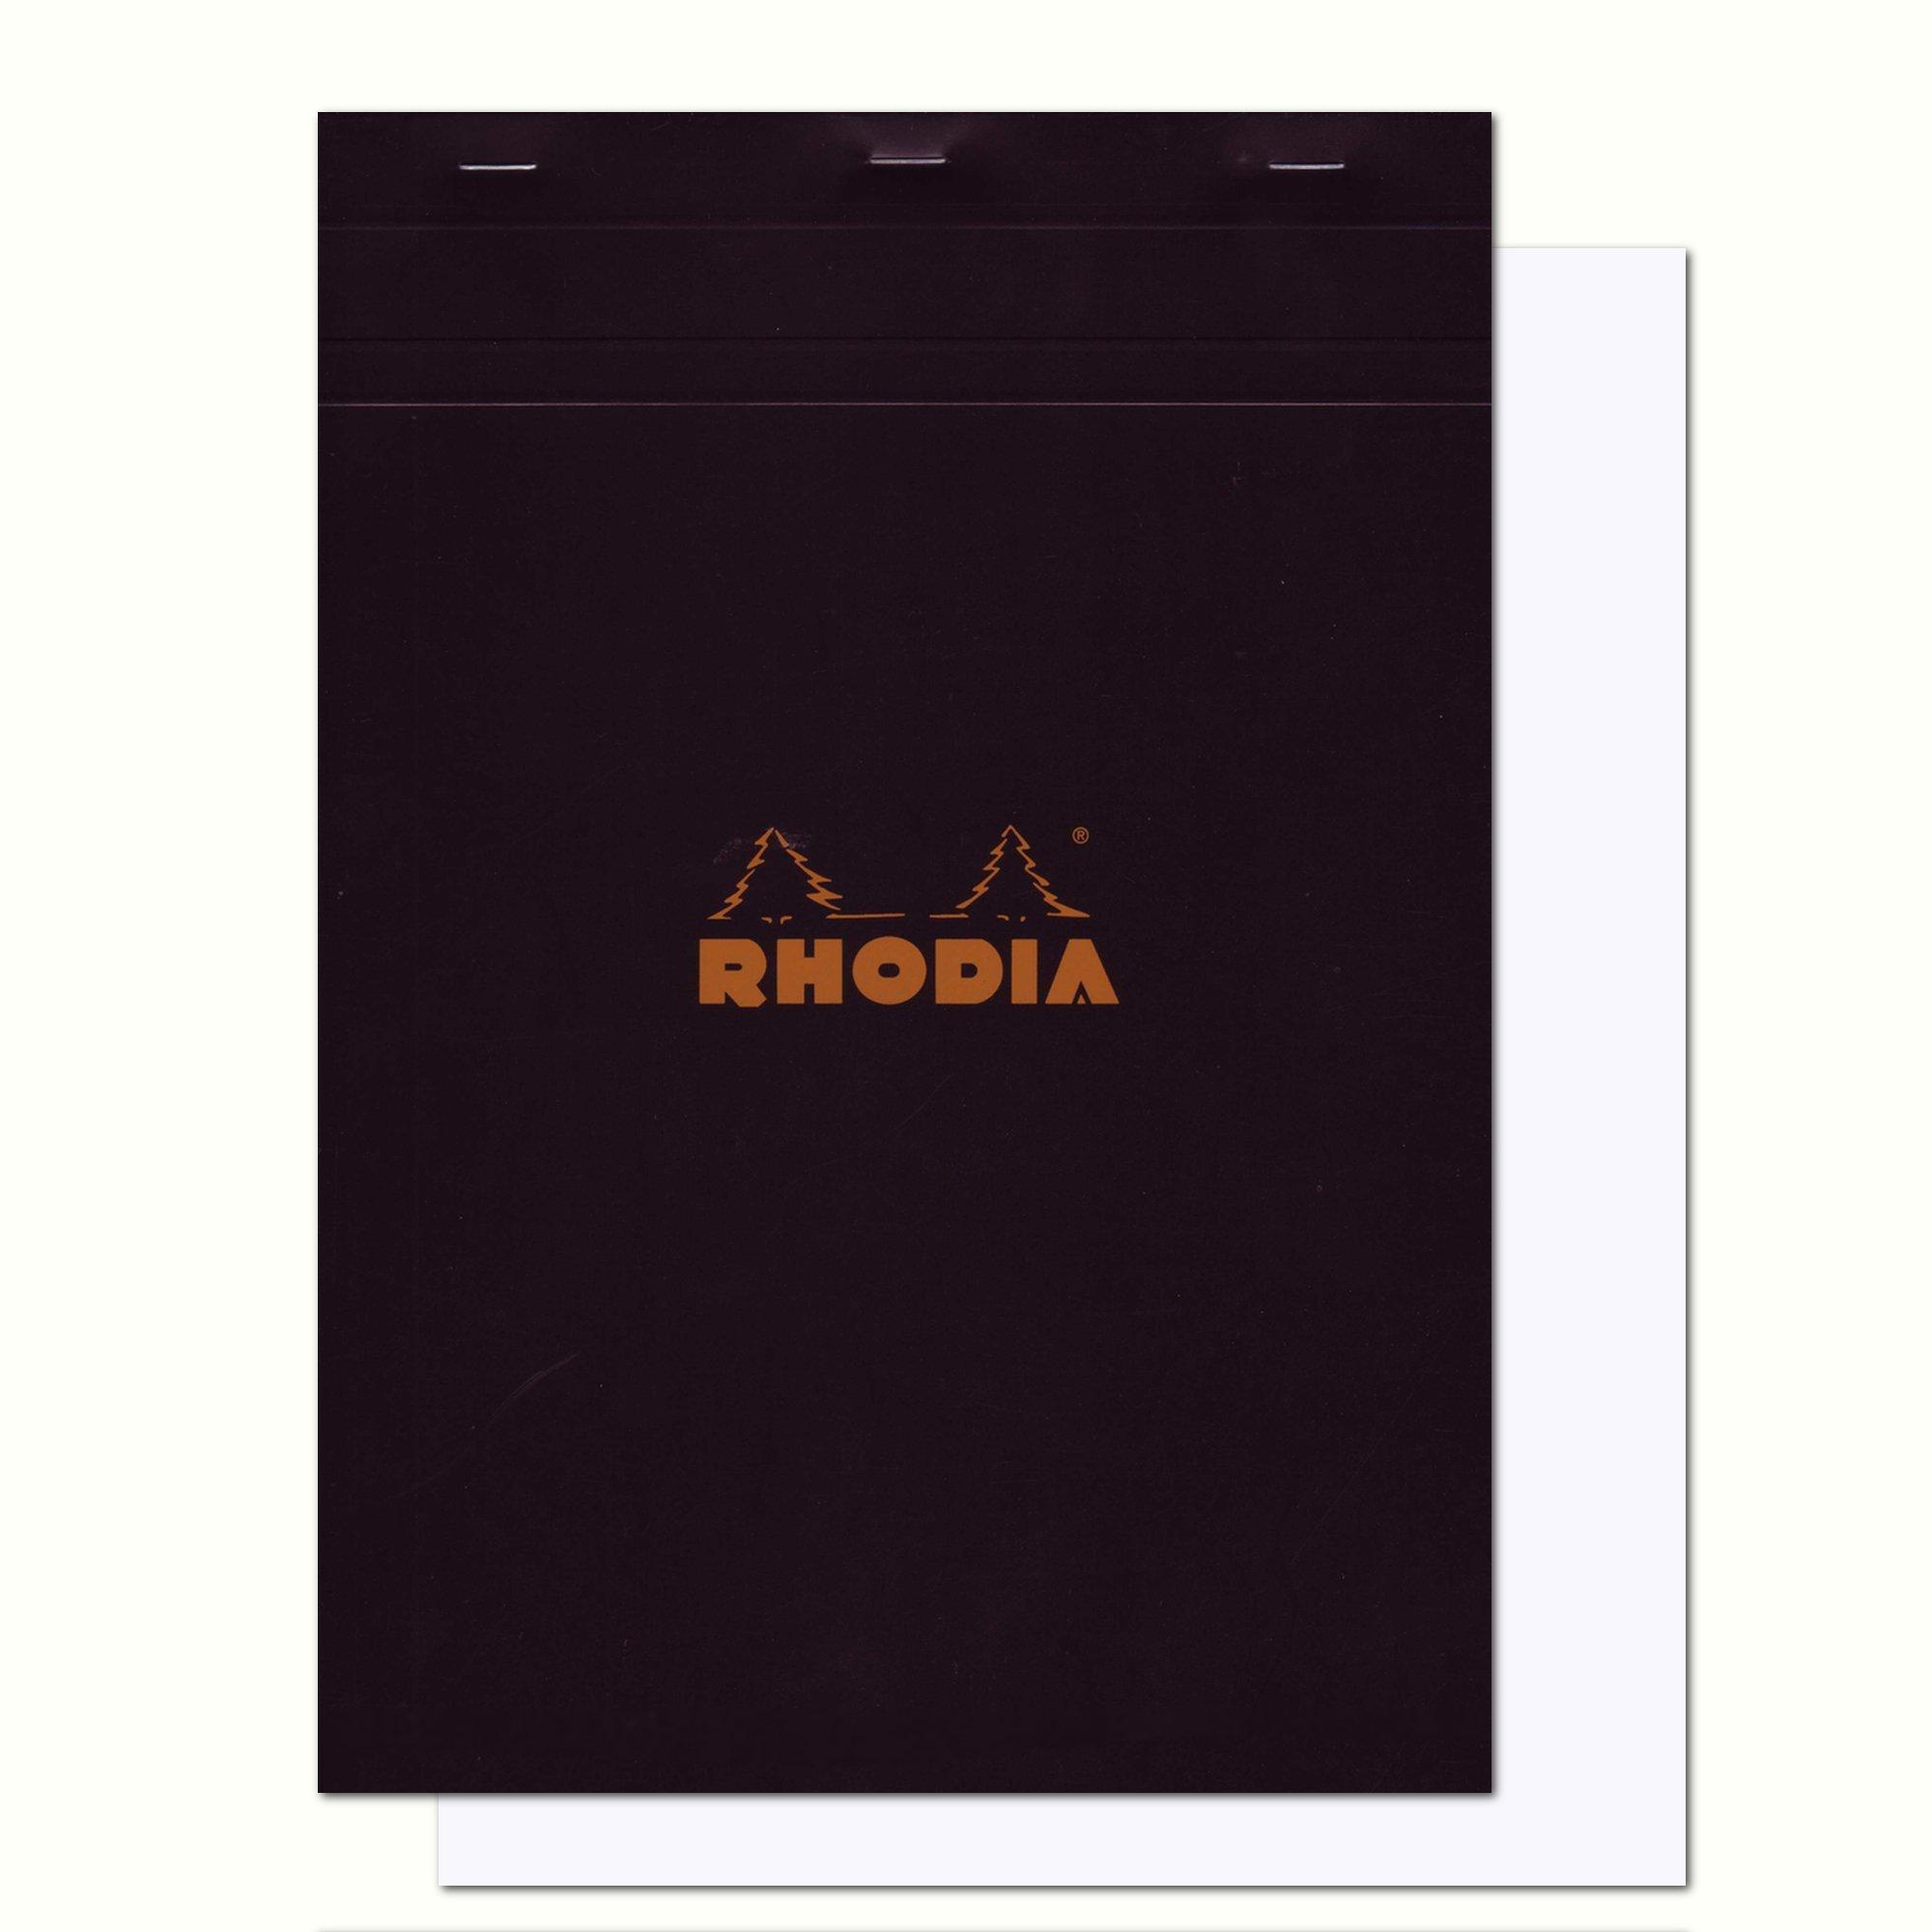 Rhodia Classic Black Notepad 8.25X11.75 Blank